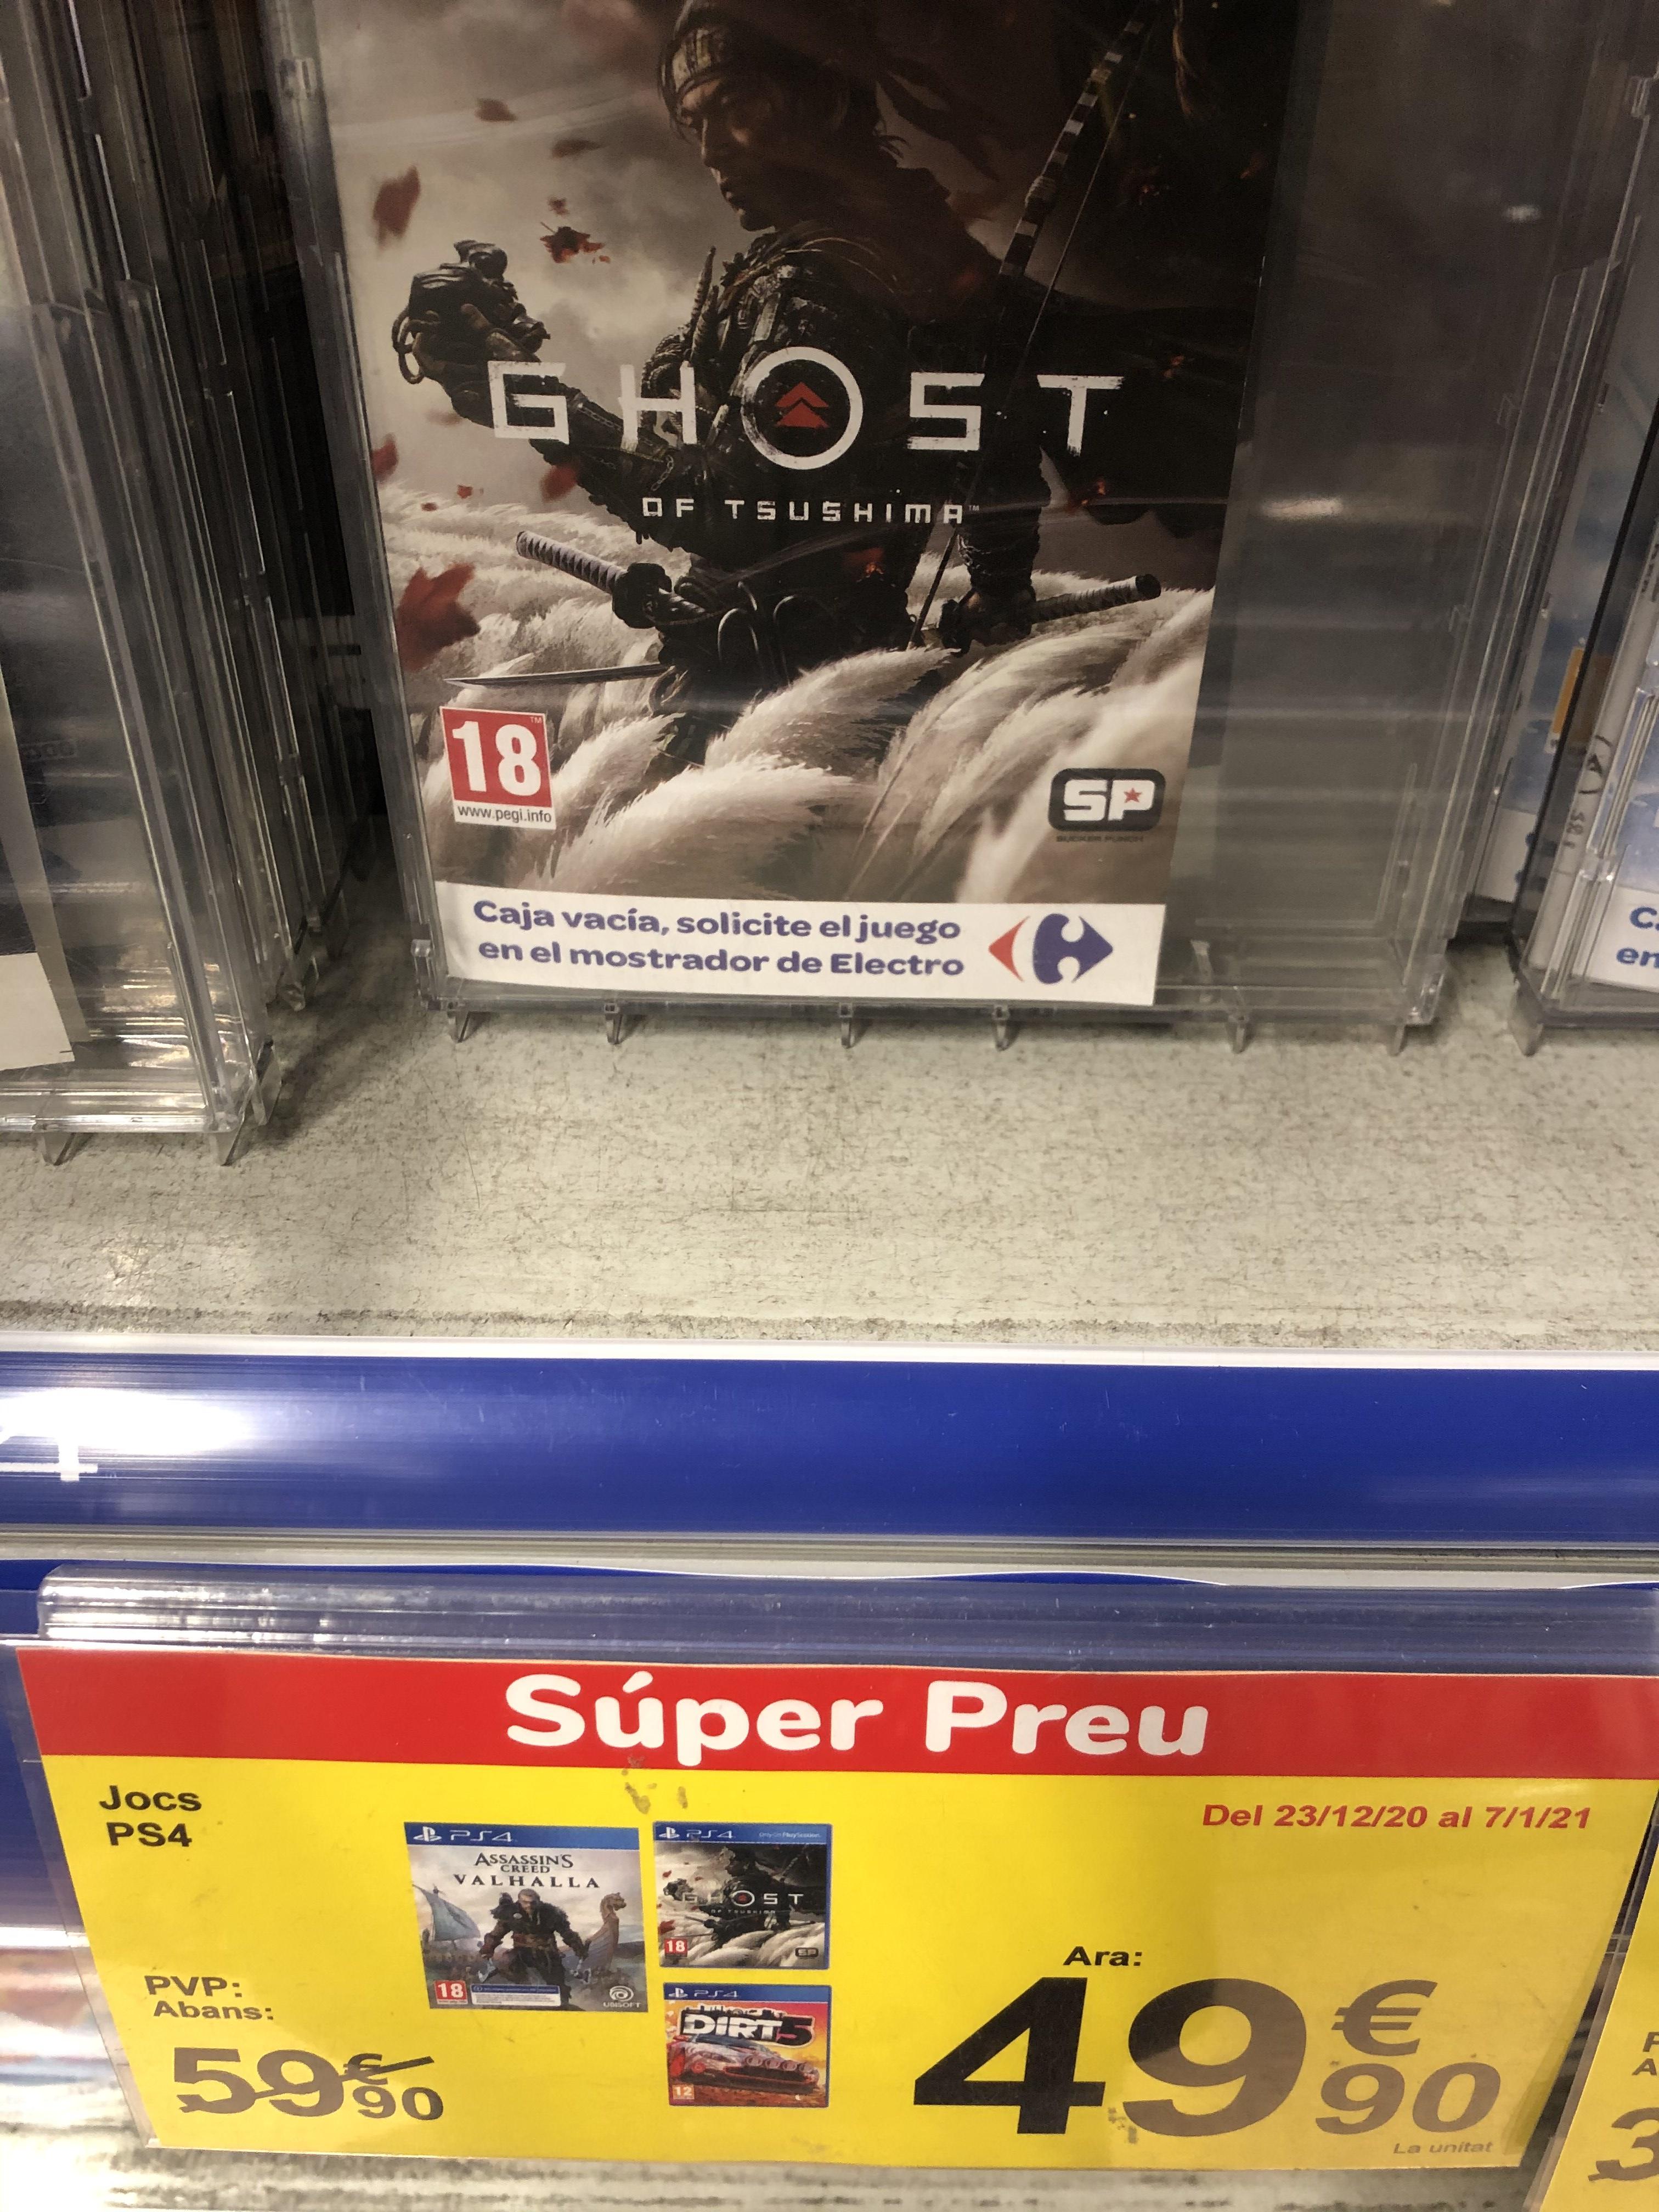 Ghost of tsushima, Assassins Creed Valhalla y Dirt 3 Carrefour Badalona